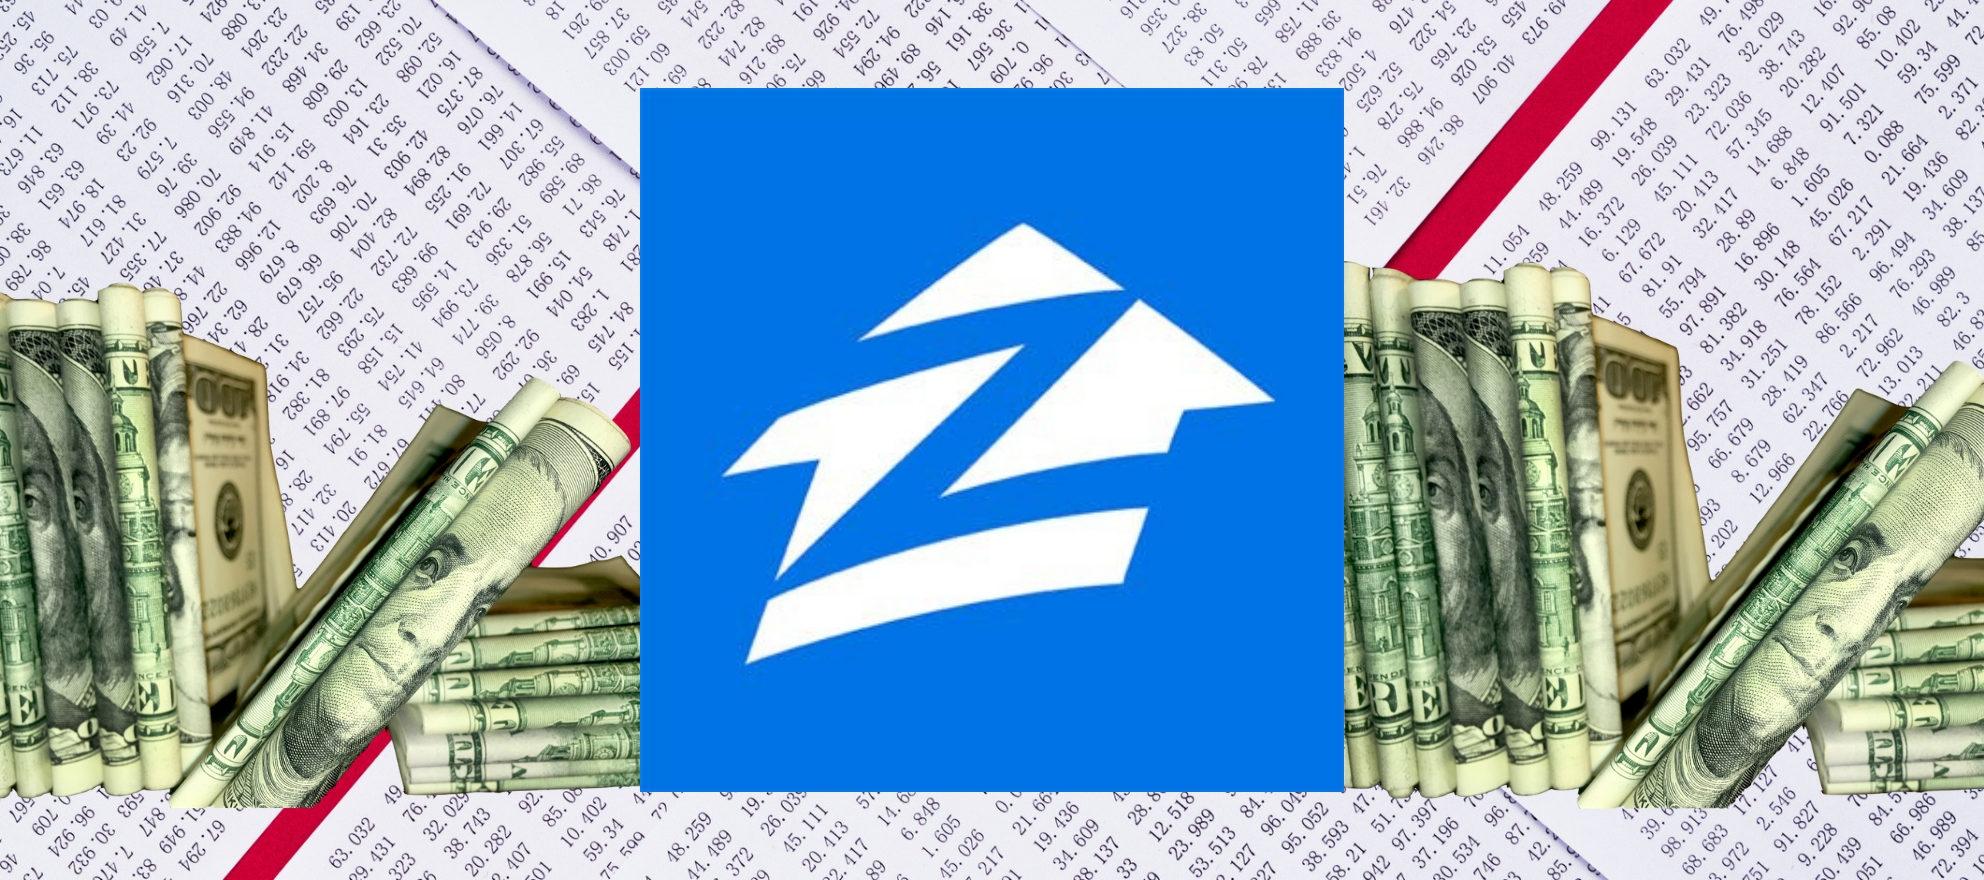 Zillow reports record $1.3B annual revenue, but losses widen